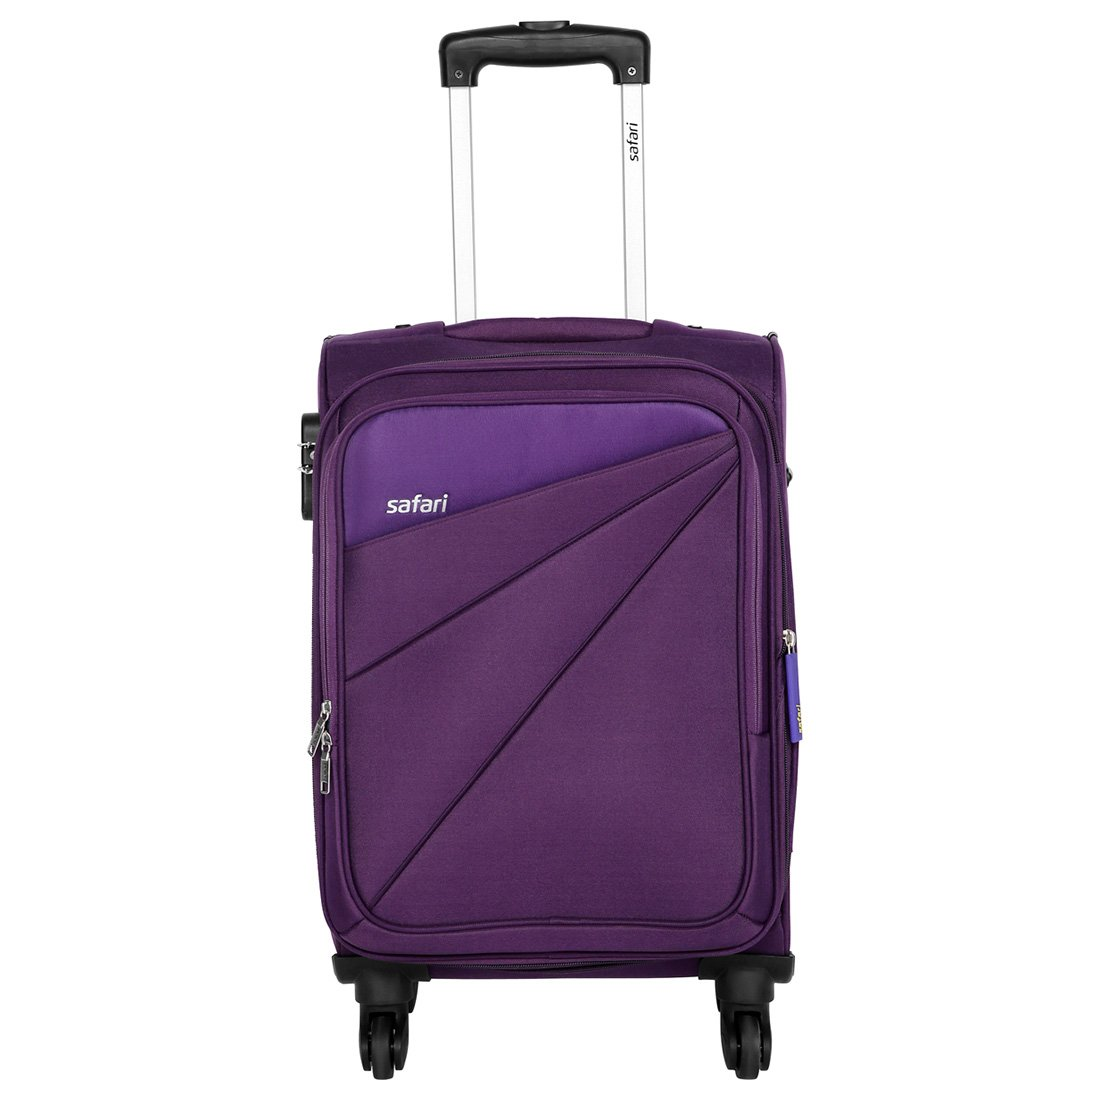 Safari Fabric 58 cms Purple Soft Sided Carry-On (Mimik 4W 58 EC Purple)